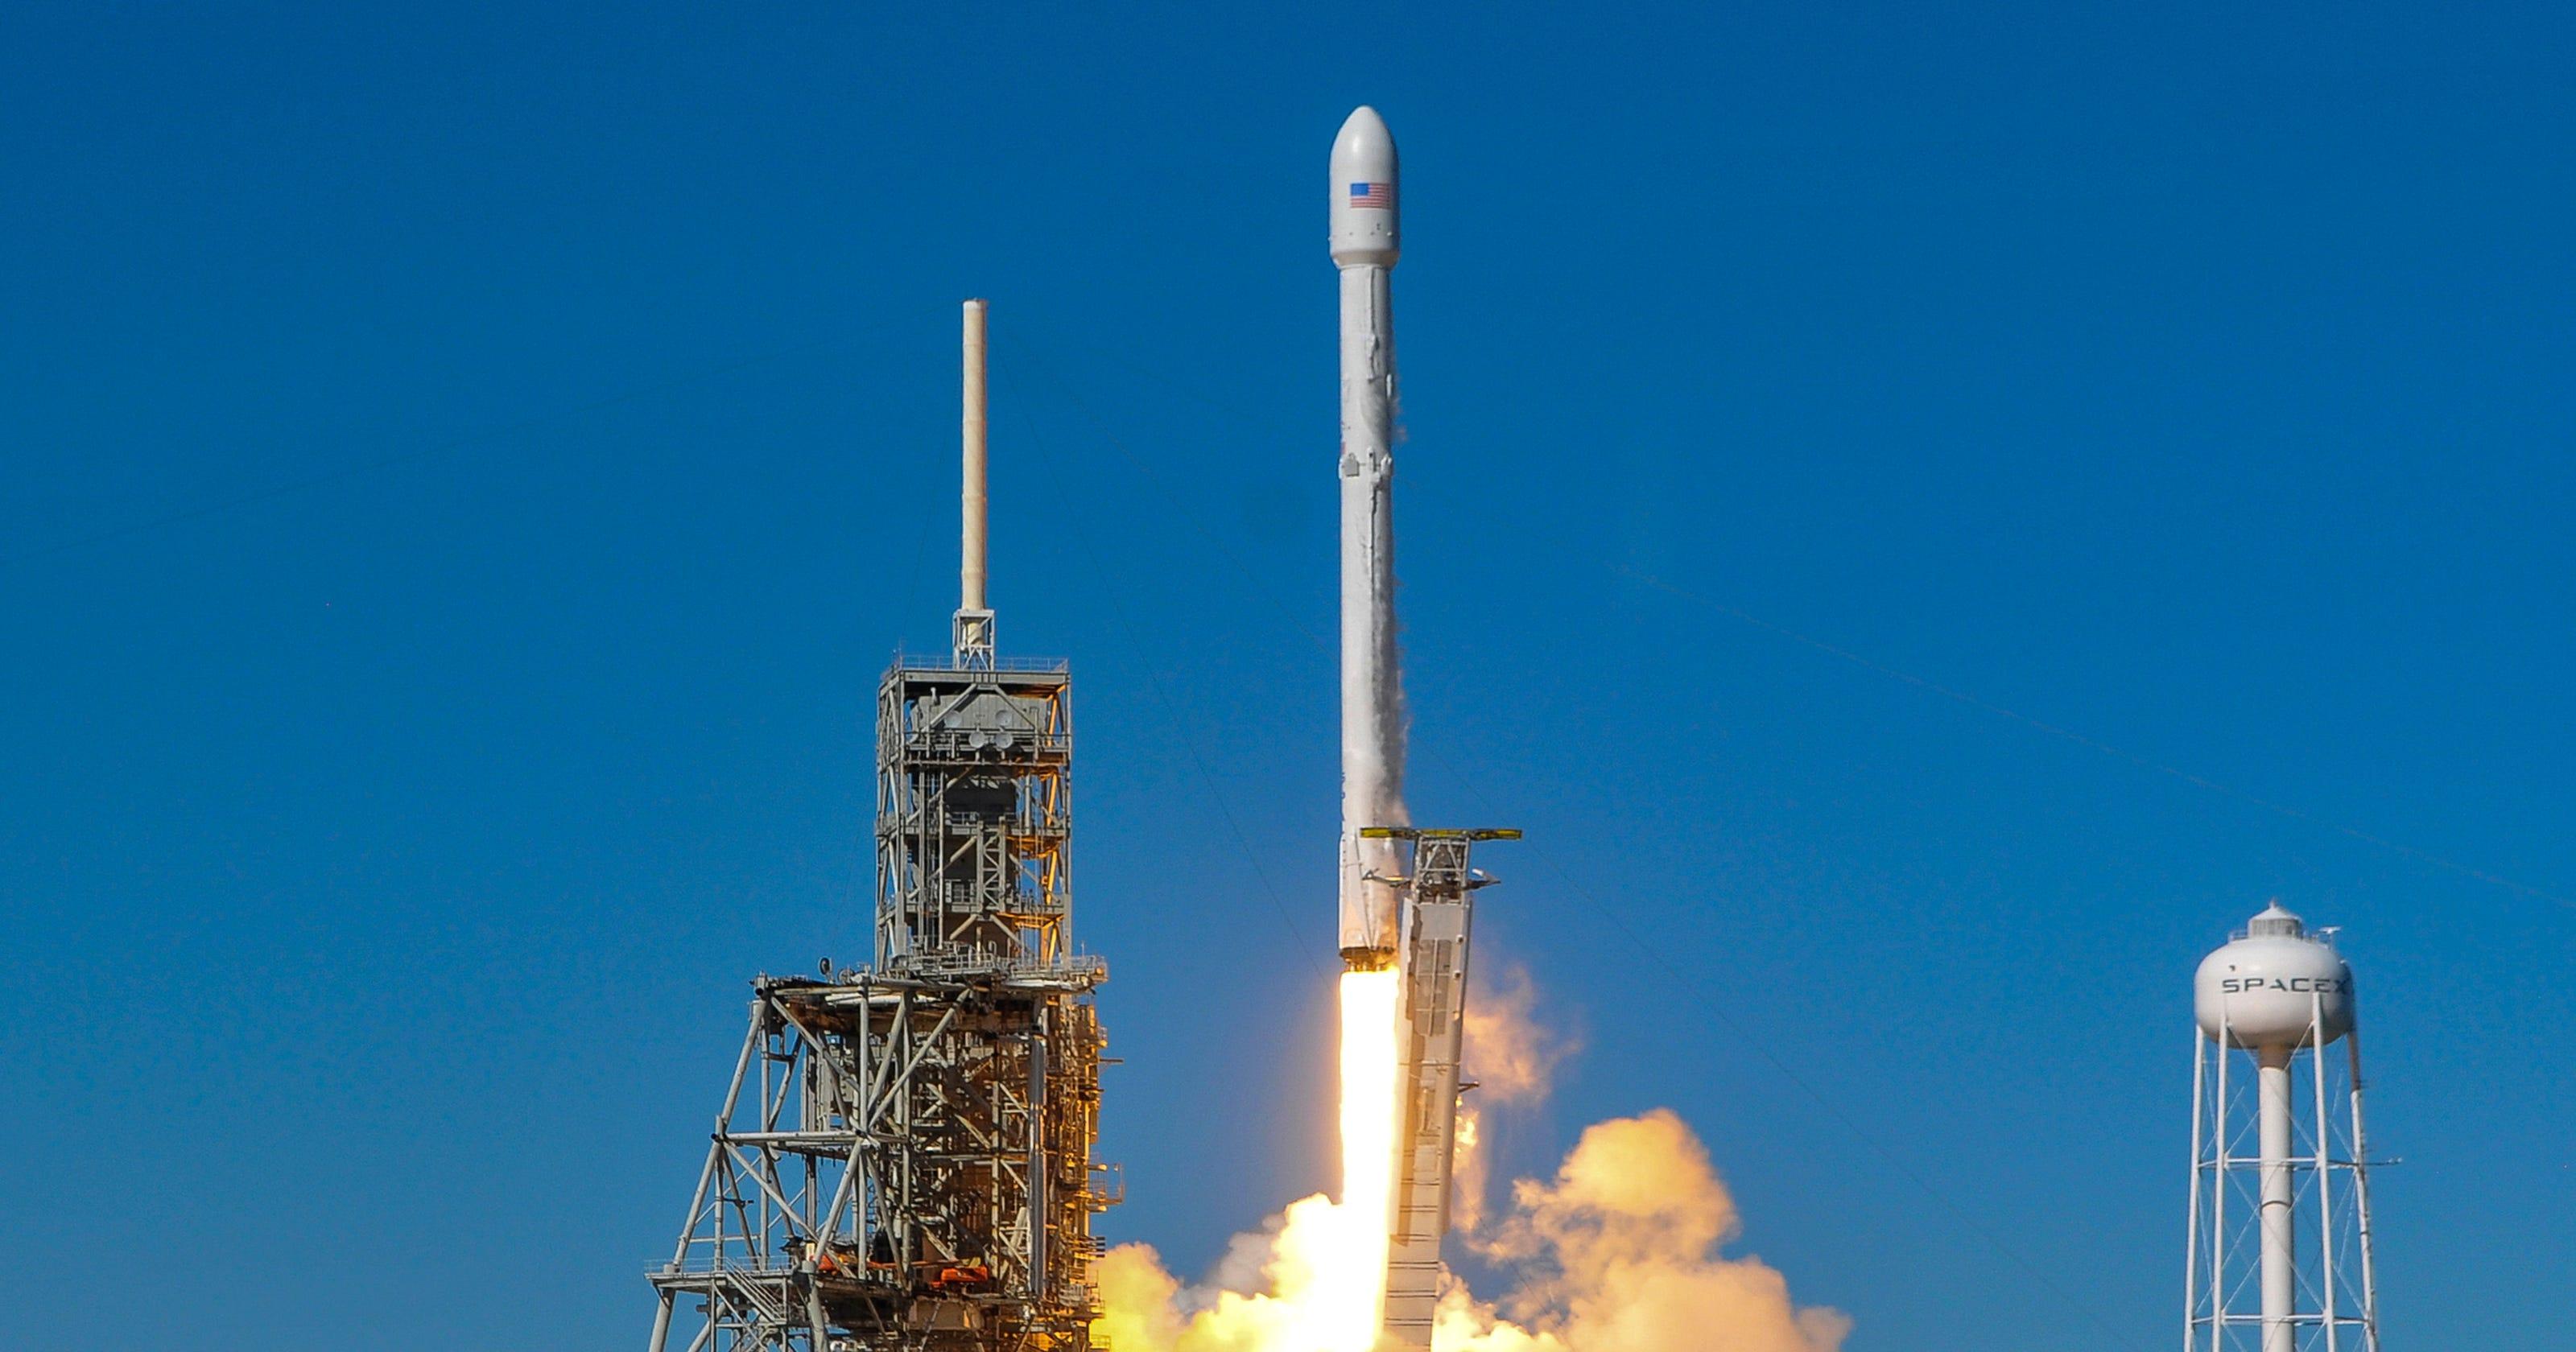 Delays keep pushing back NASA shuttle replacement program ...